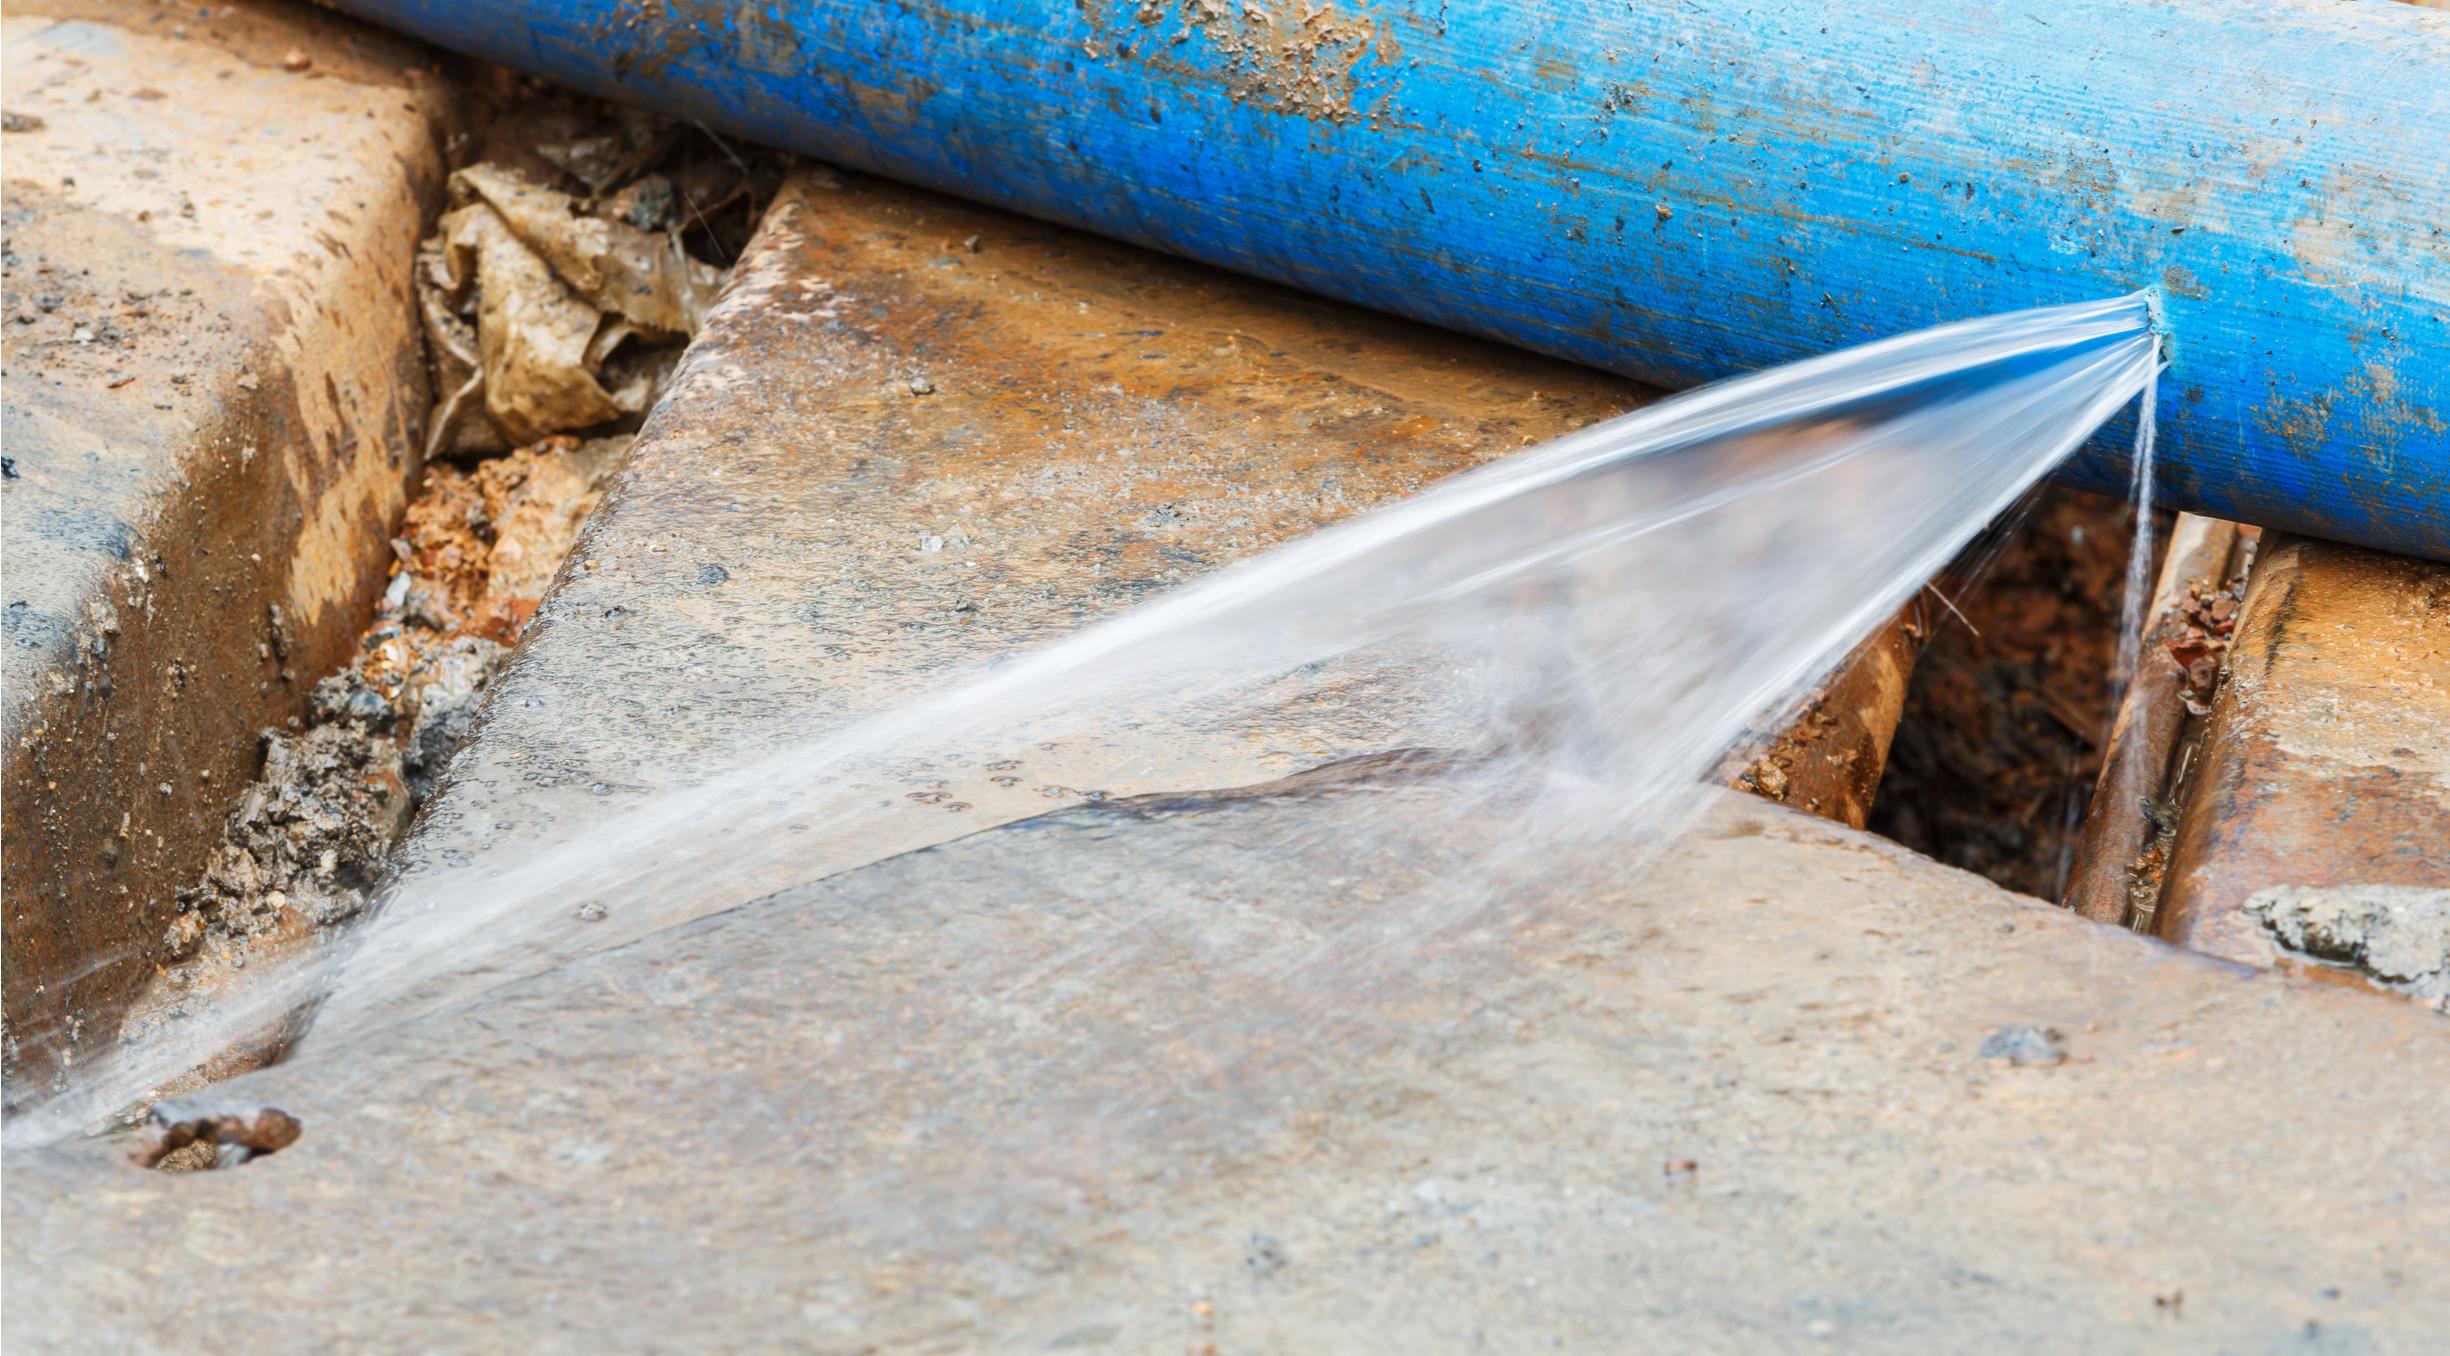 Wonkhe leaky pipe